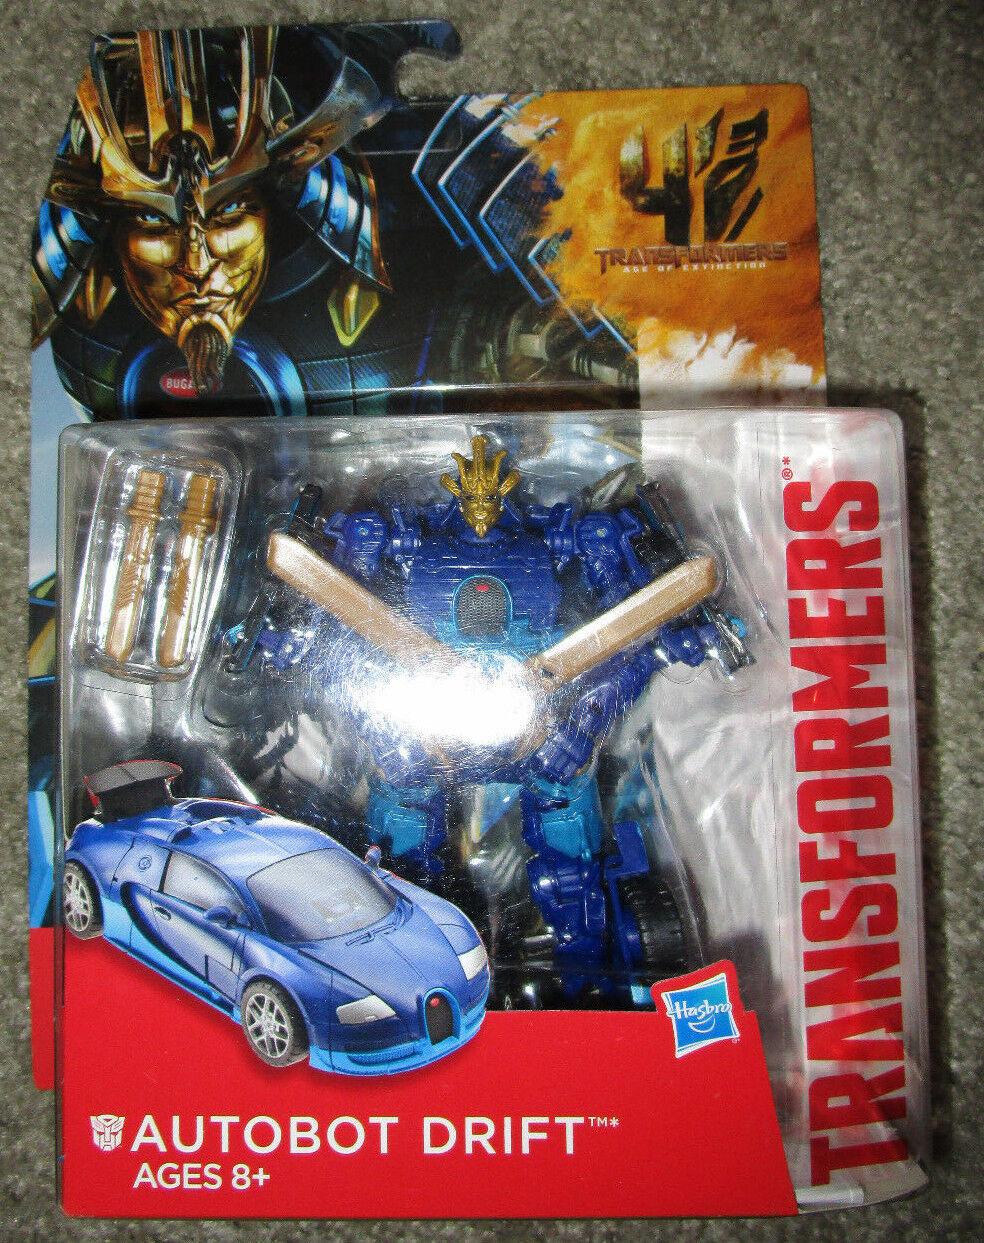 Transformers AGE OF EXTINCTION Deluxe Class Figure AUTOBOT DRIFT BUGATTI MODE